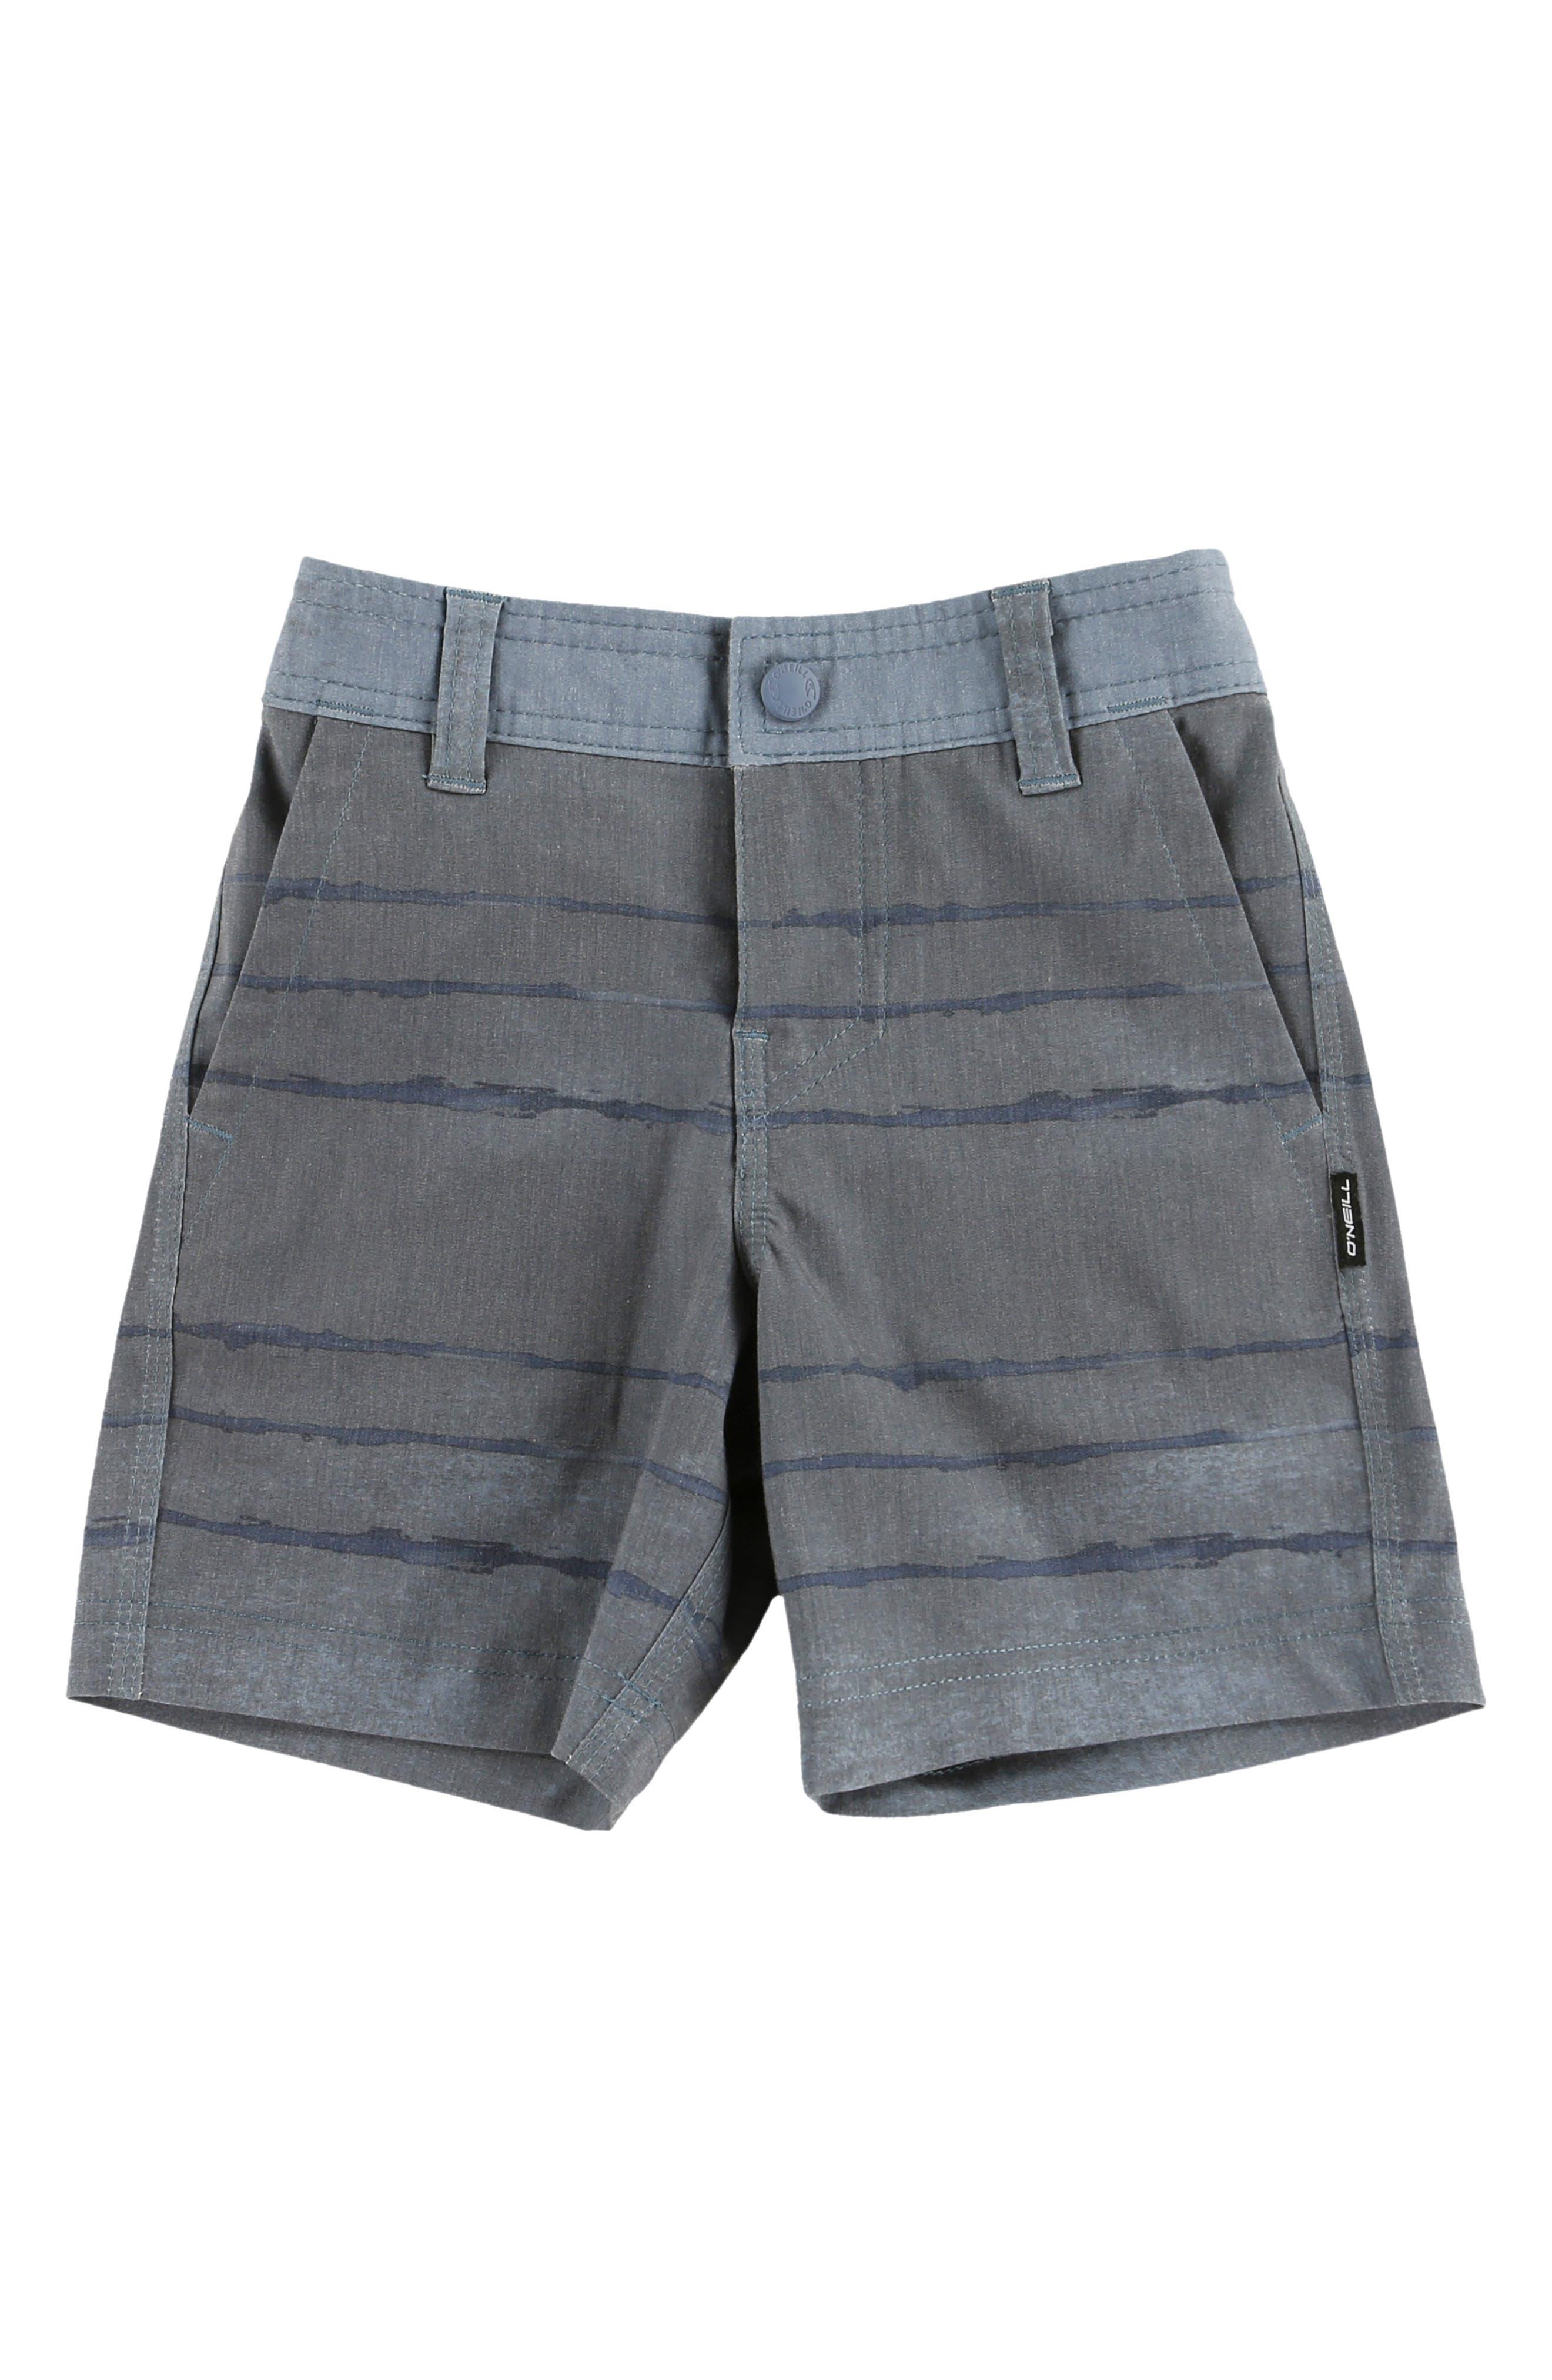 Tye Striper Hybrid Shorts,                         Main,                         color, DUST BLUE